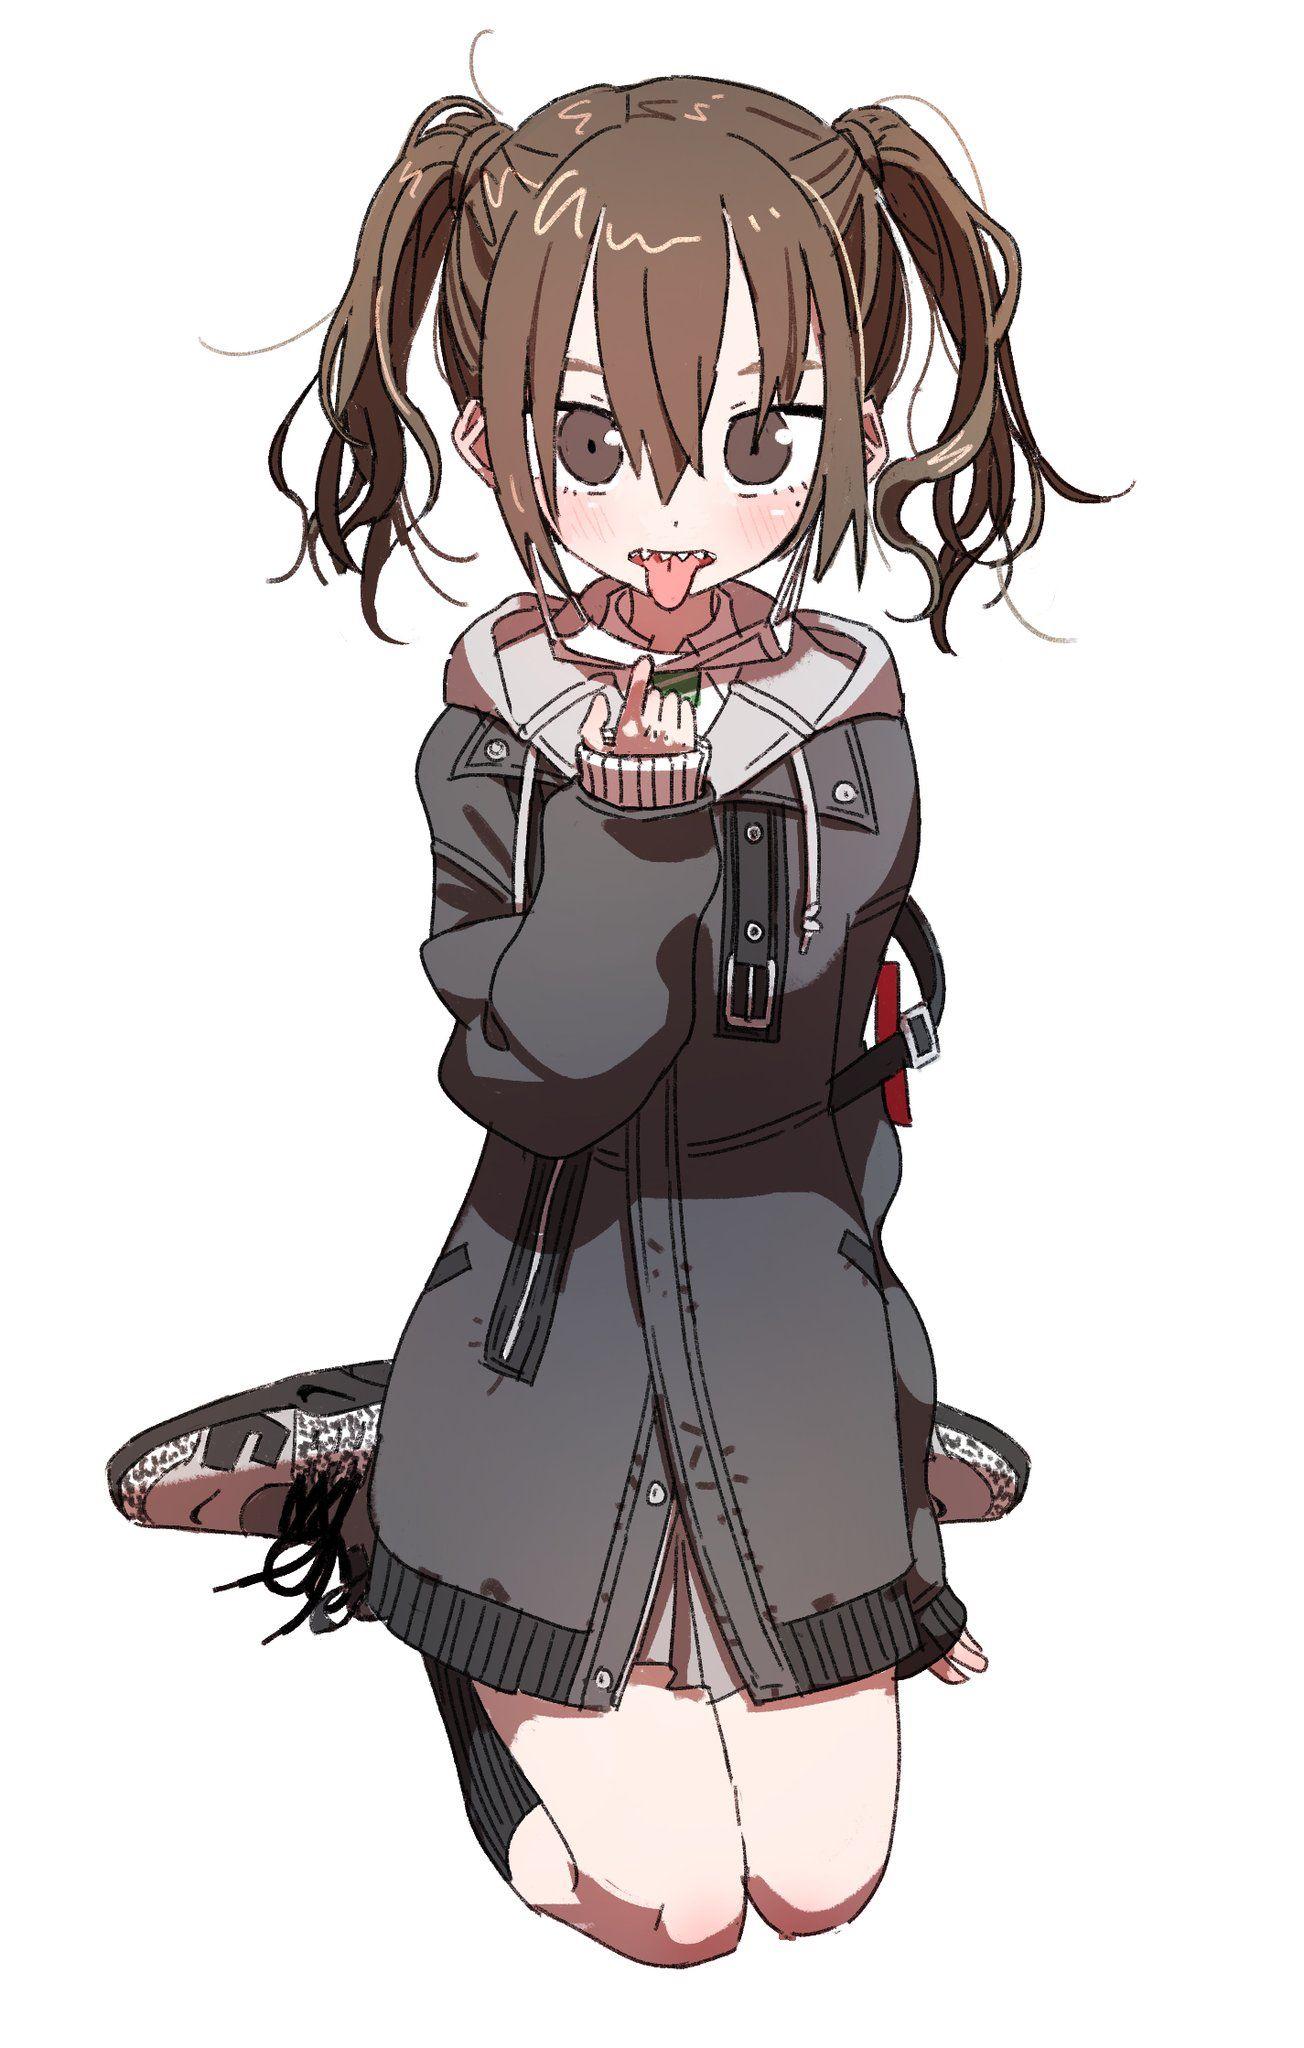 00 cute おしゃれまとめの人気アイデア pinterest rosallie r かわいいアニメの女の子 イラスト アニメ